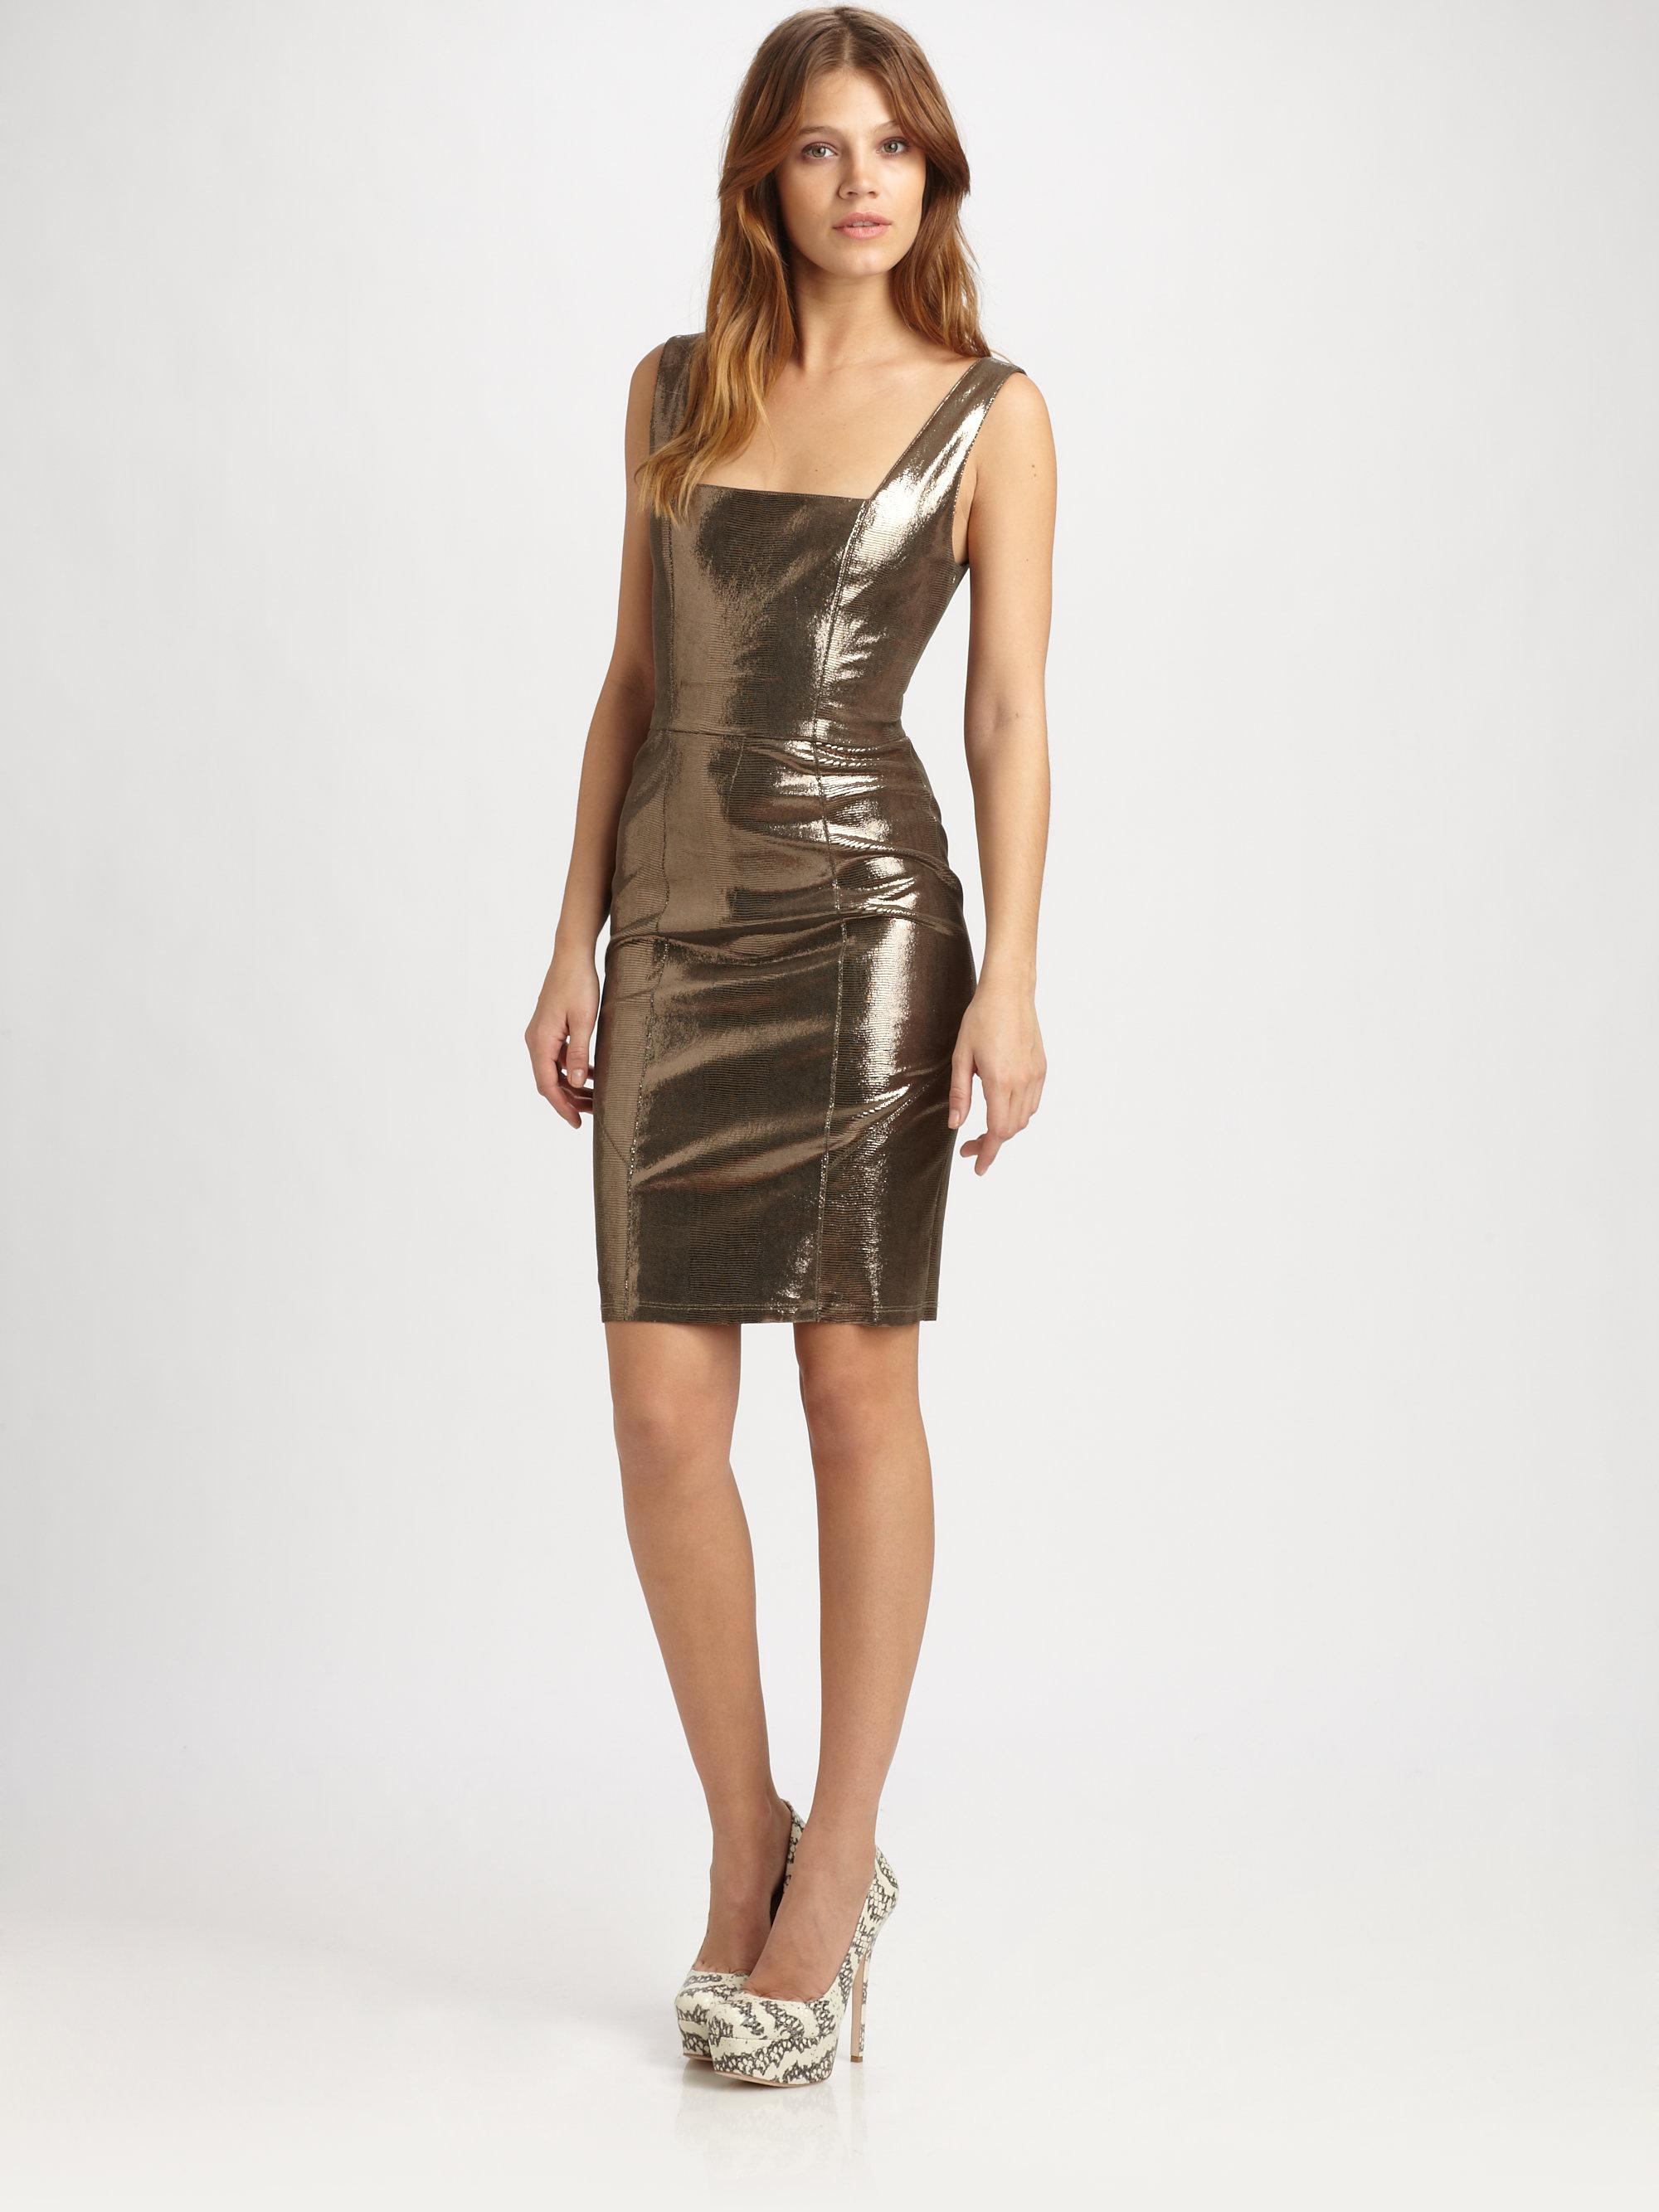 Lyst Alice Olivia Norah Metallic Leather Dress In Metallic